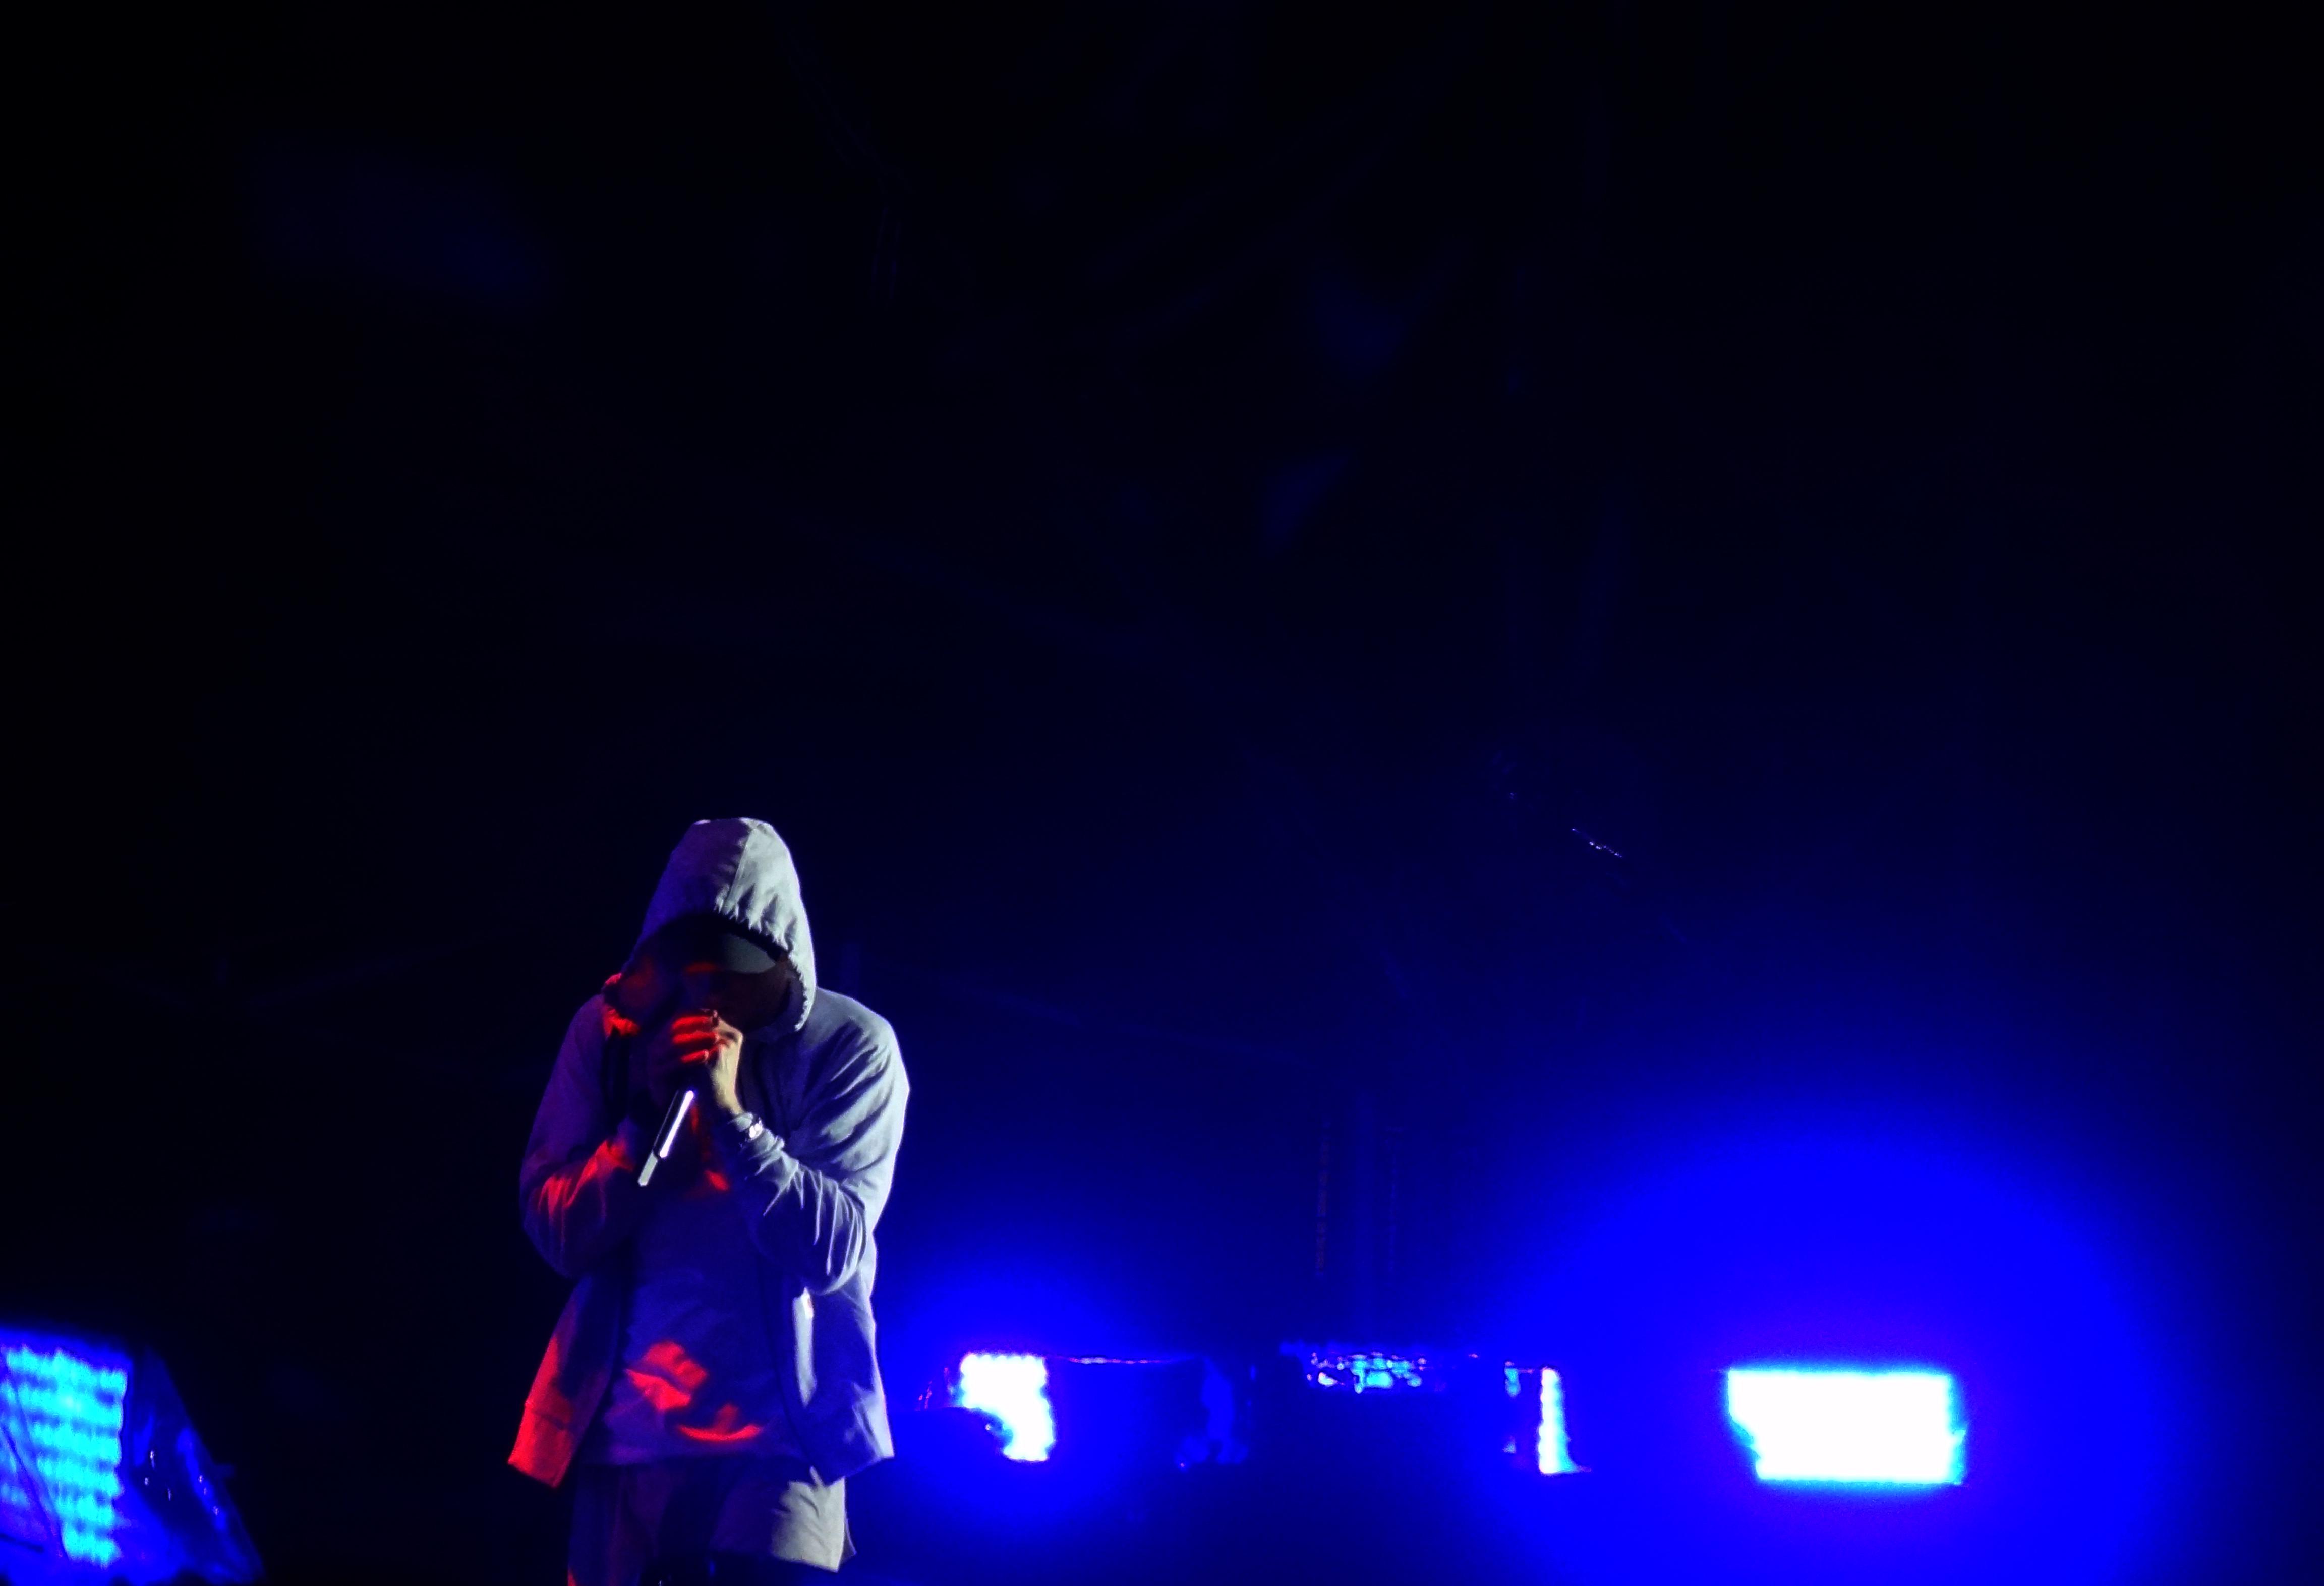 Eminem\'s concert